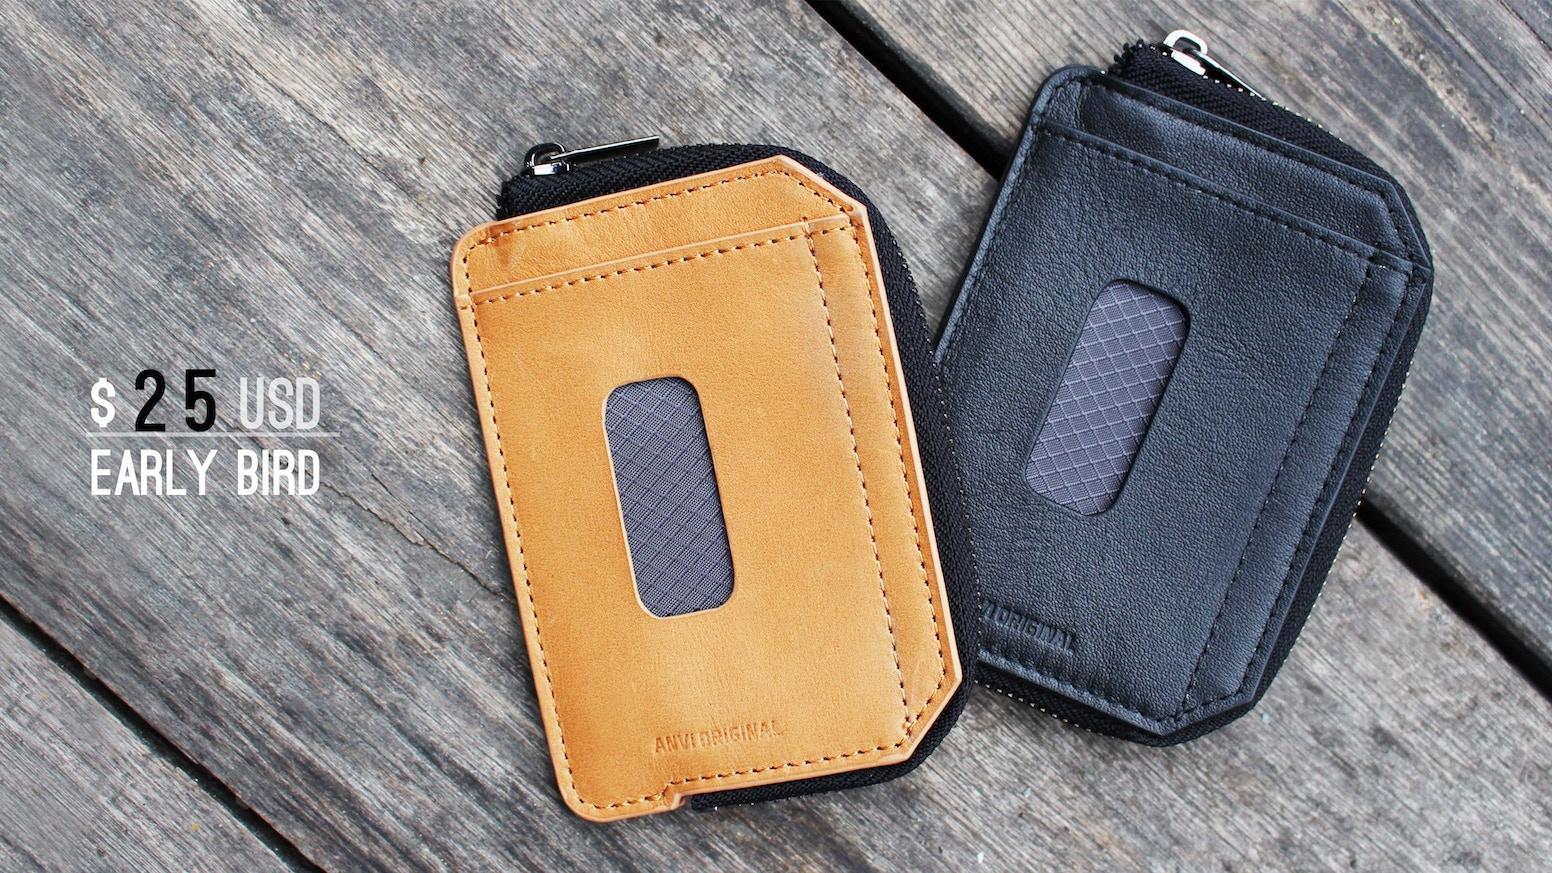 dd1300cb970 ZIP: Minimal RFID zipper leather slim wallet for minimalist. Easily hold  10+ cards ...